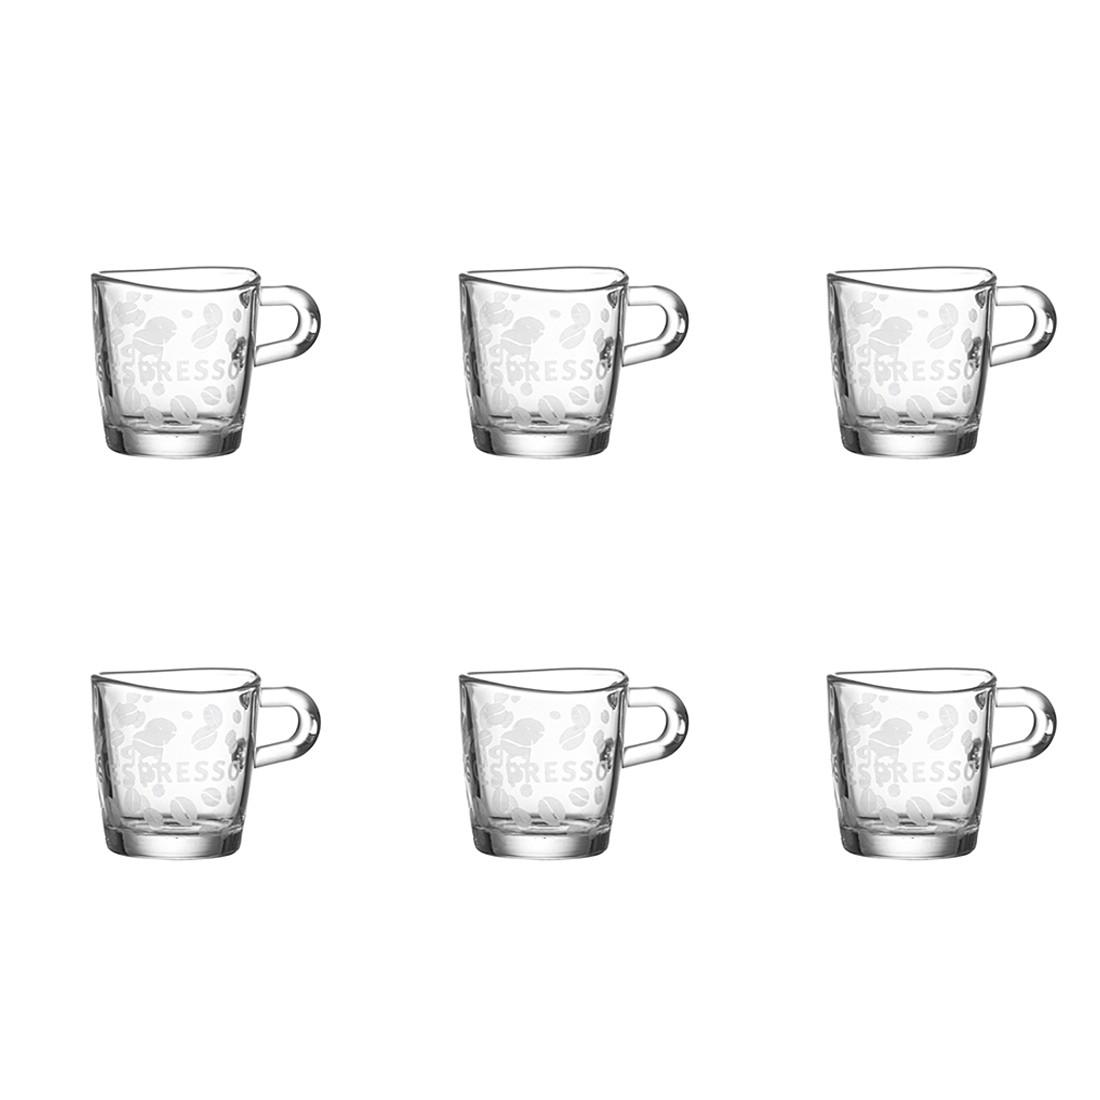 Espressotasse Loop (6er-Set) – Satiniert, Leonardo kaufen